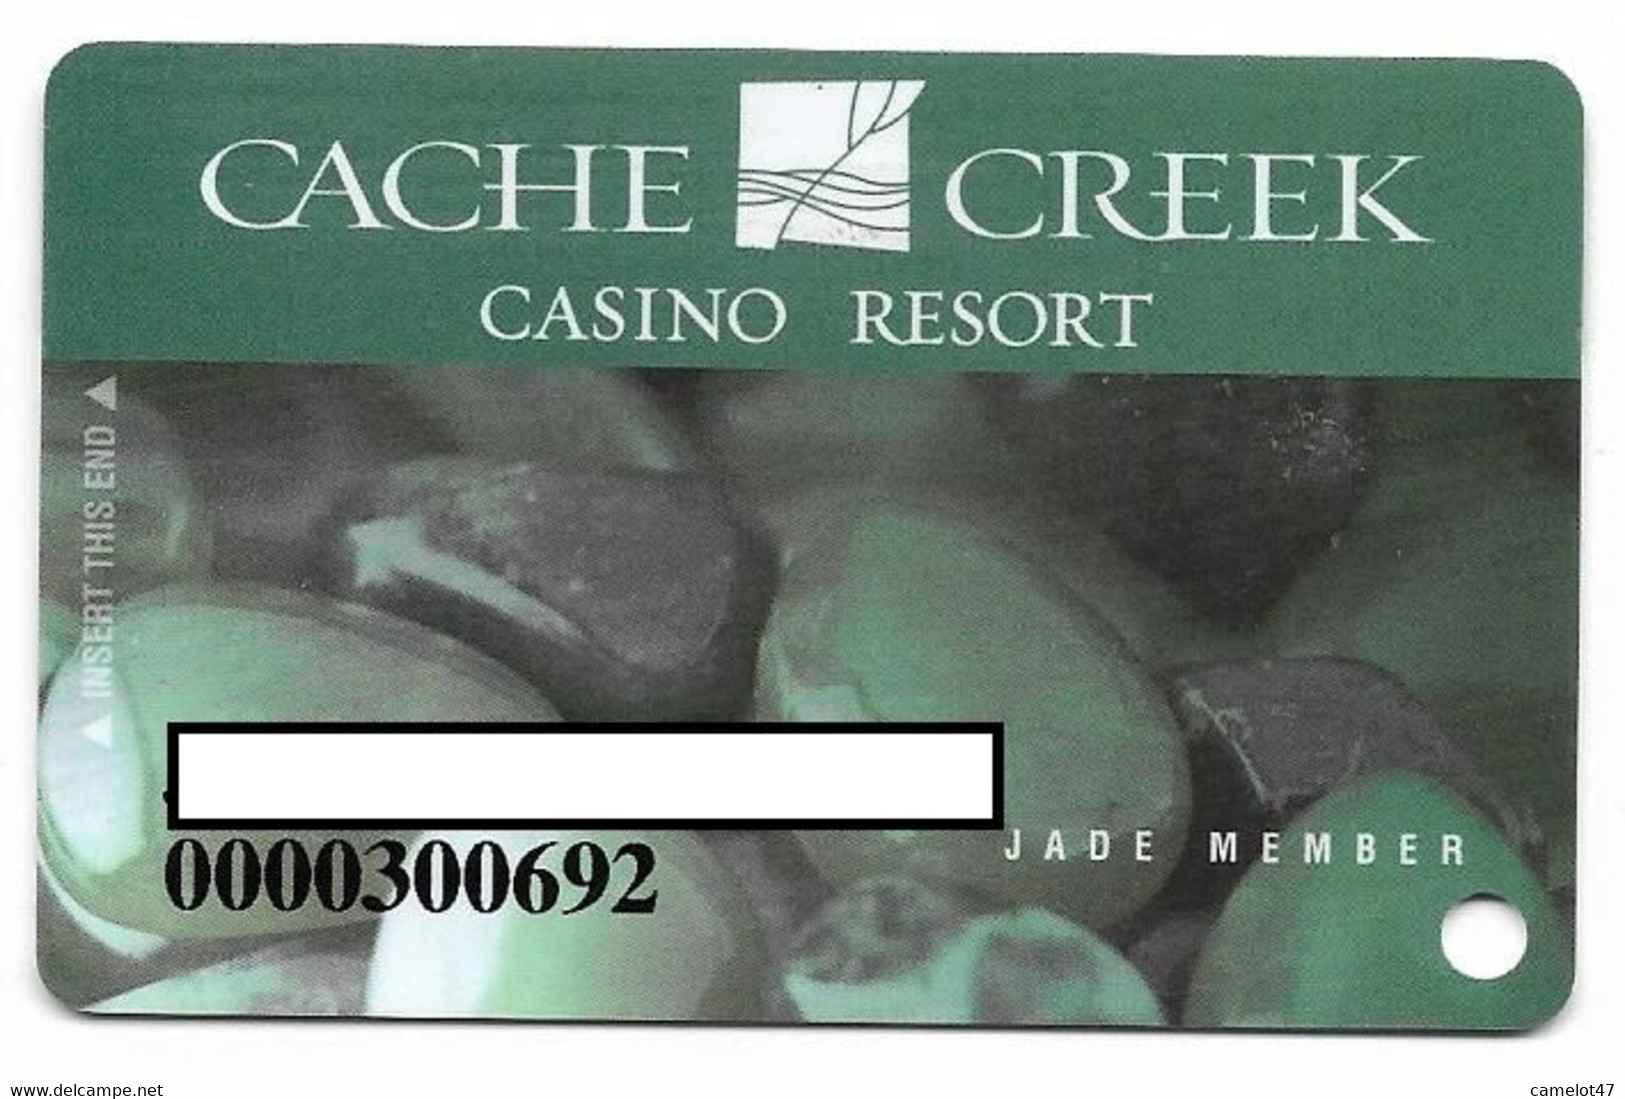 Cache Creek Casino, Brooks, CA, U.S.A., Older Used Slot Or Player's Card, # Cachecreek-1 - Casino Cards